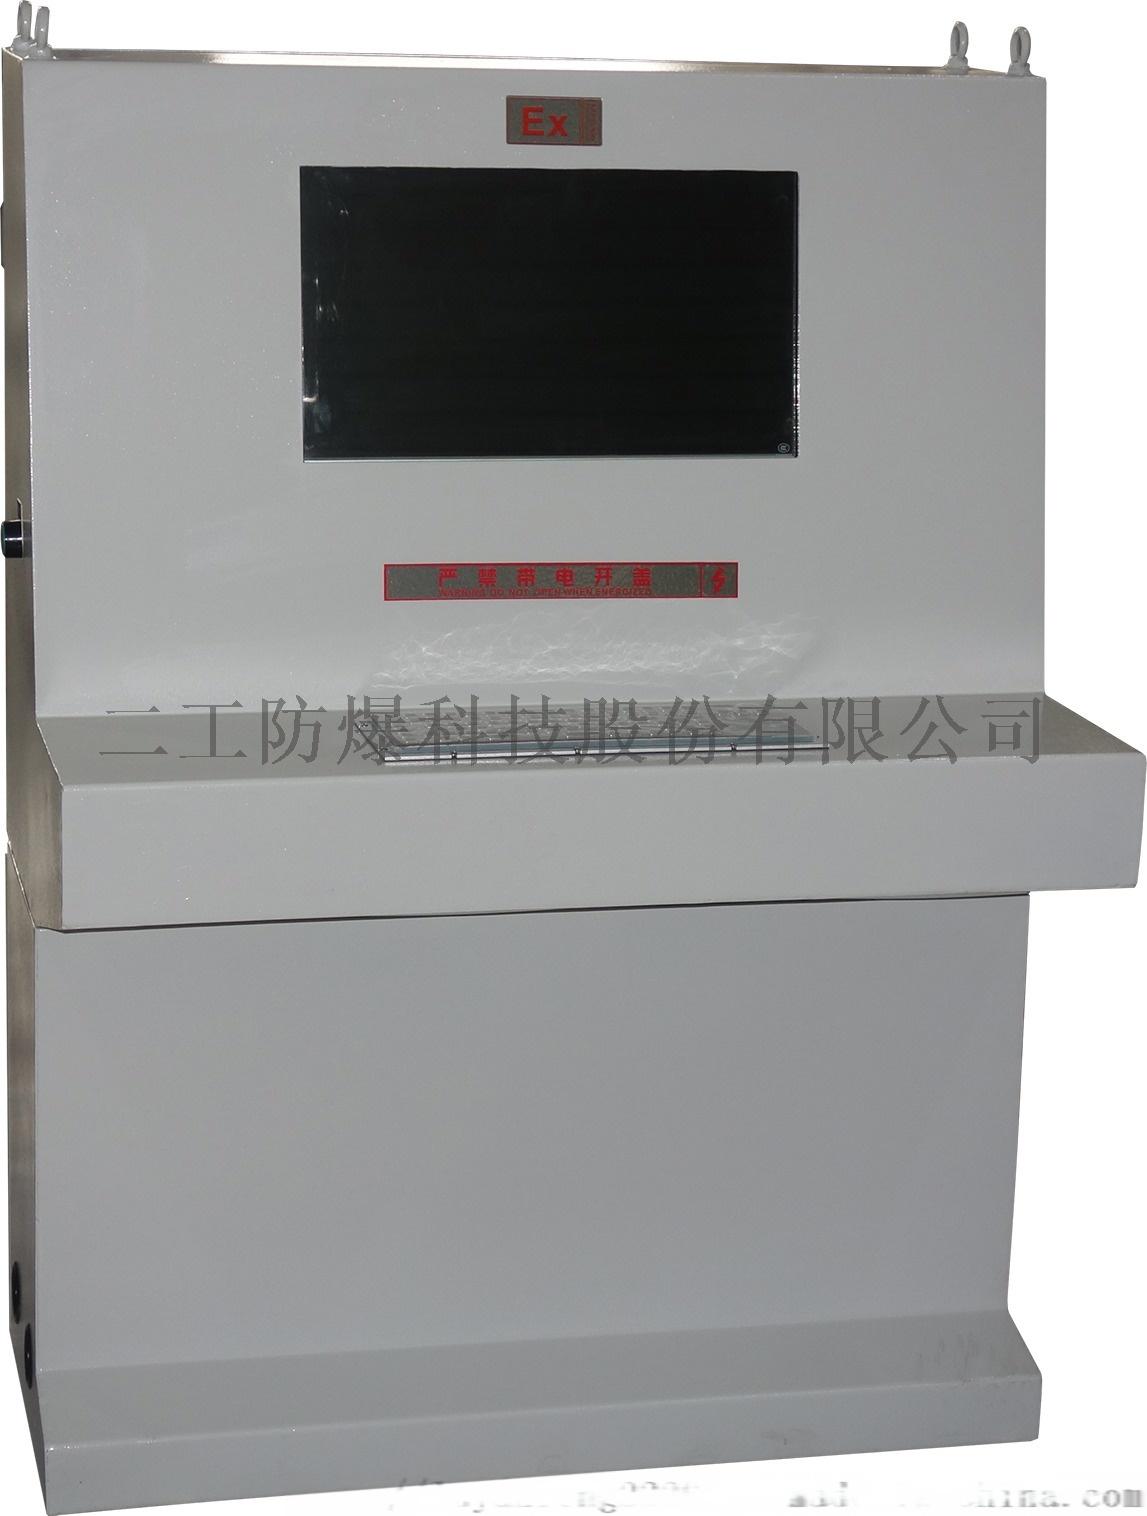 DSC00786改.jpg